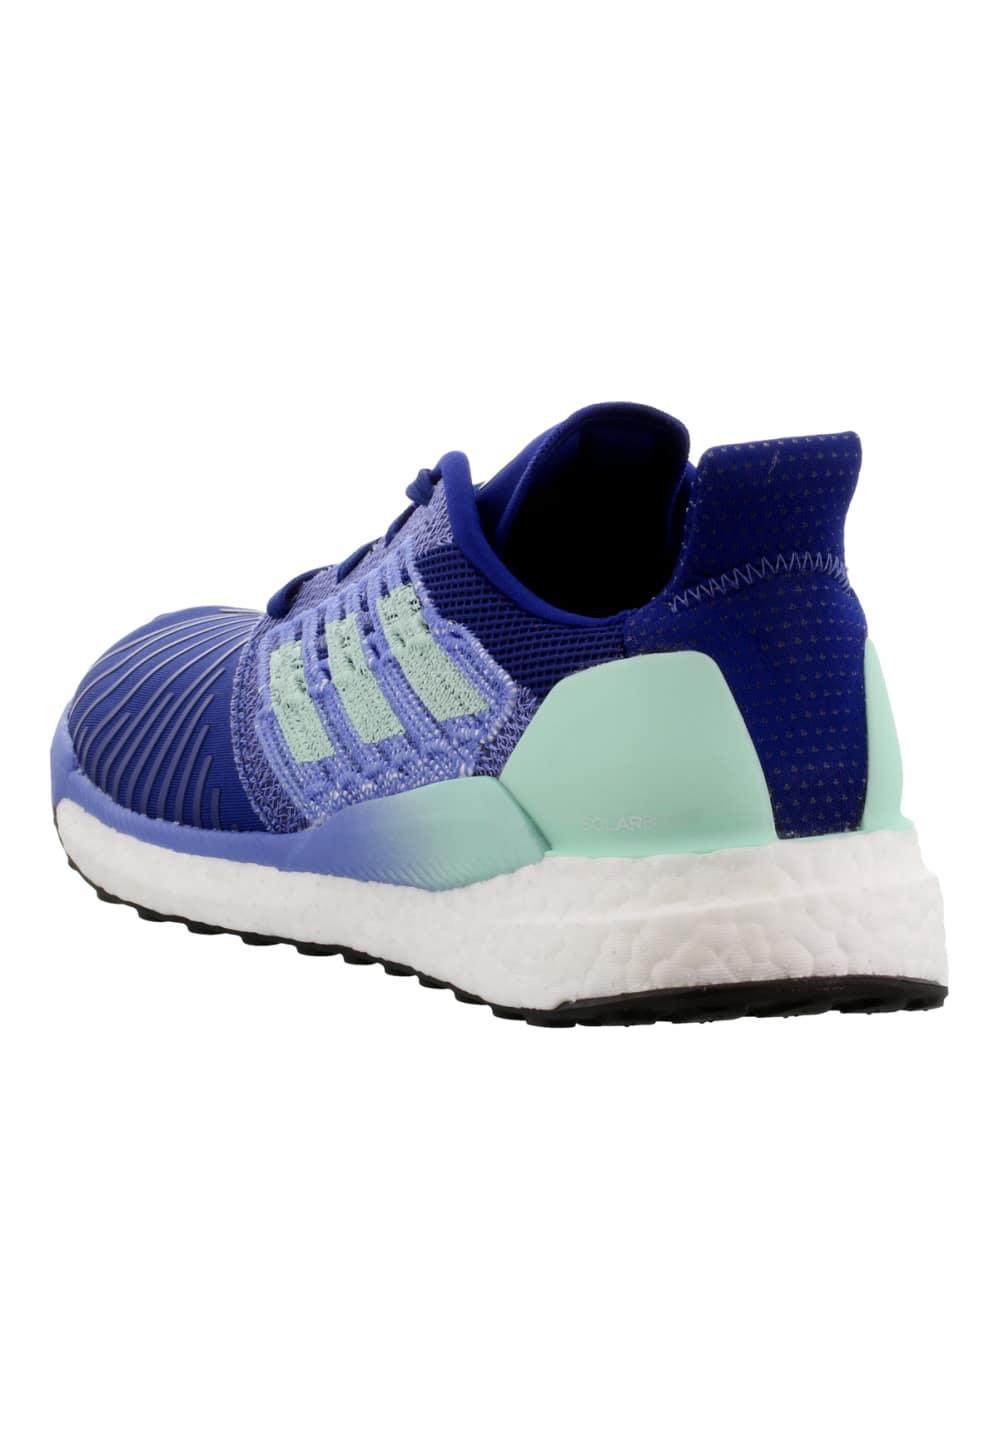 wholesale dealer 45064 05555 adidas Solar Boost - Laufschuhe für Damen - Blau  21RUN